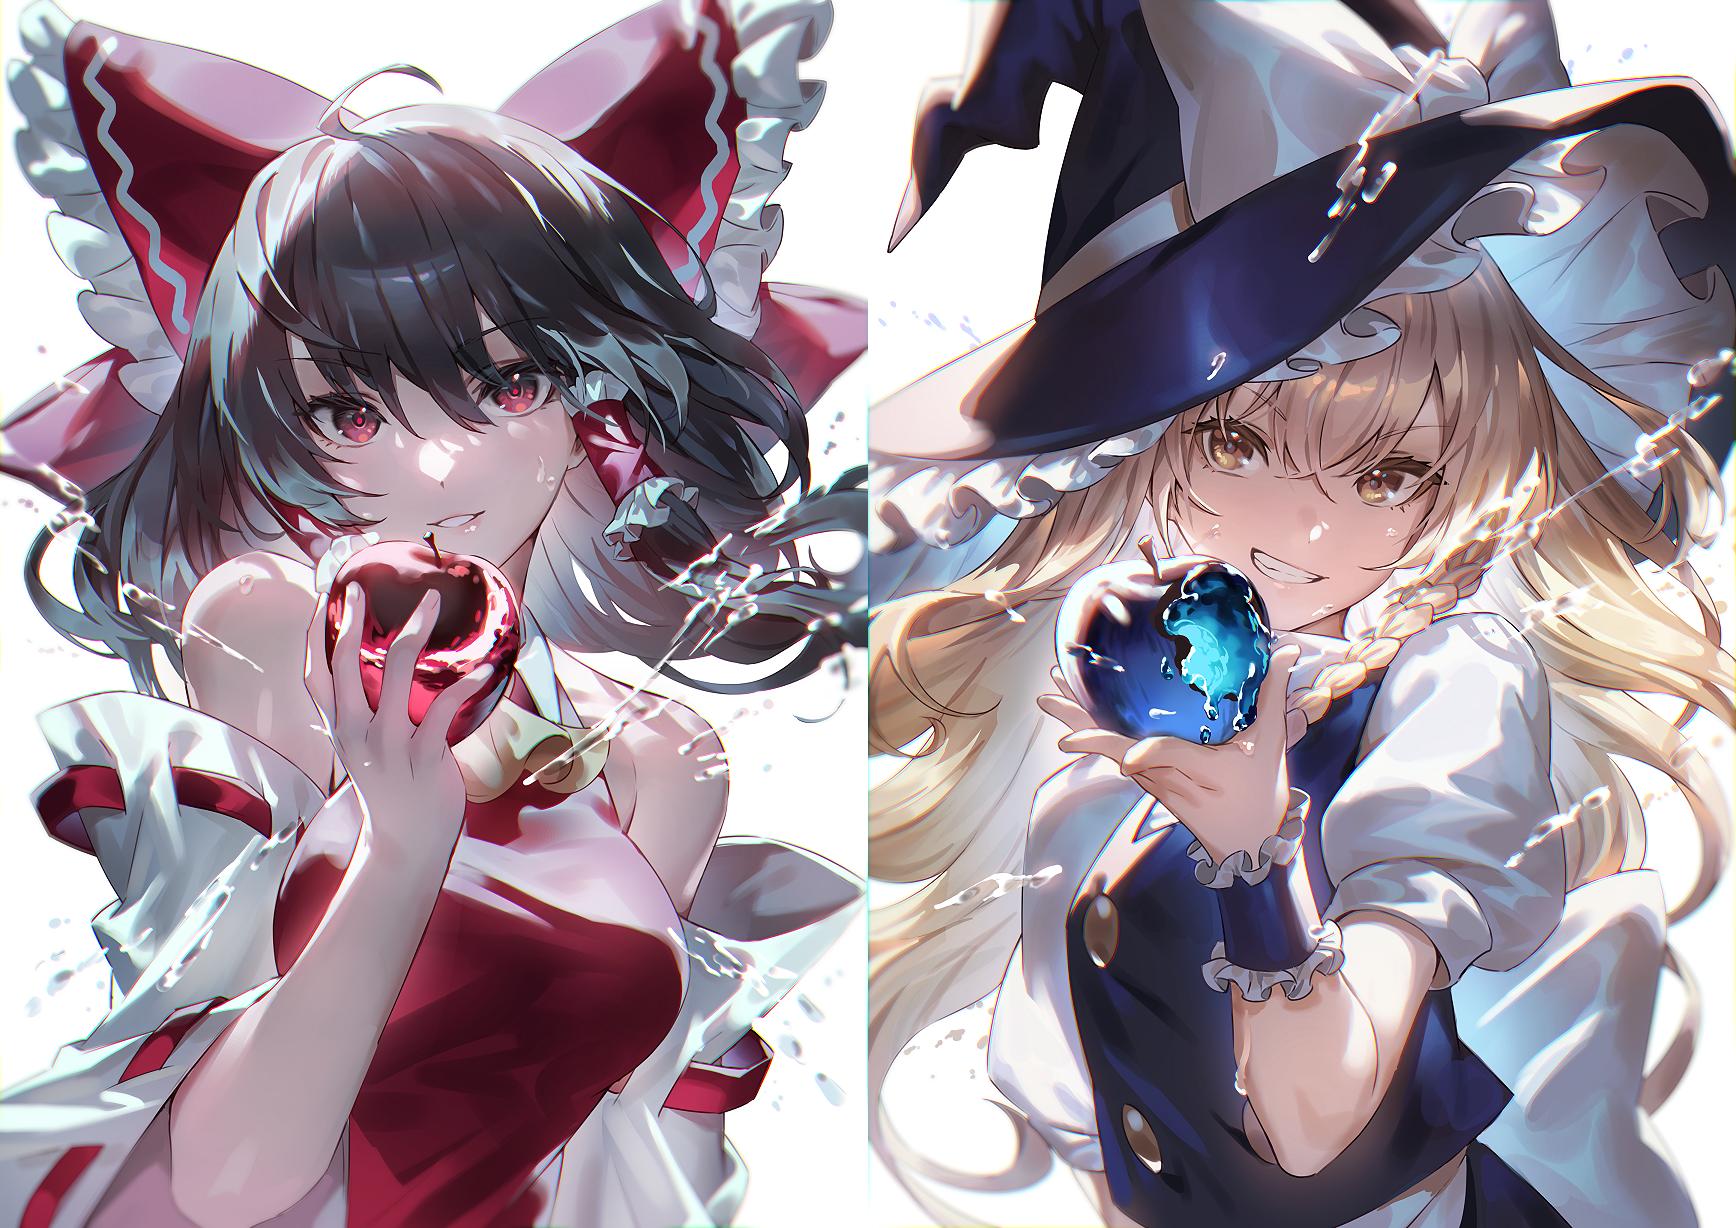 Anime Anime Girls Digital Art Artwork 2D Portrait Hakurei Reimu Kirisame Marisa Touhou Uu Uu Zan App 1736x1228